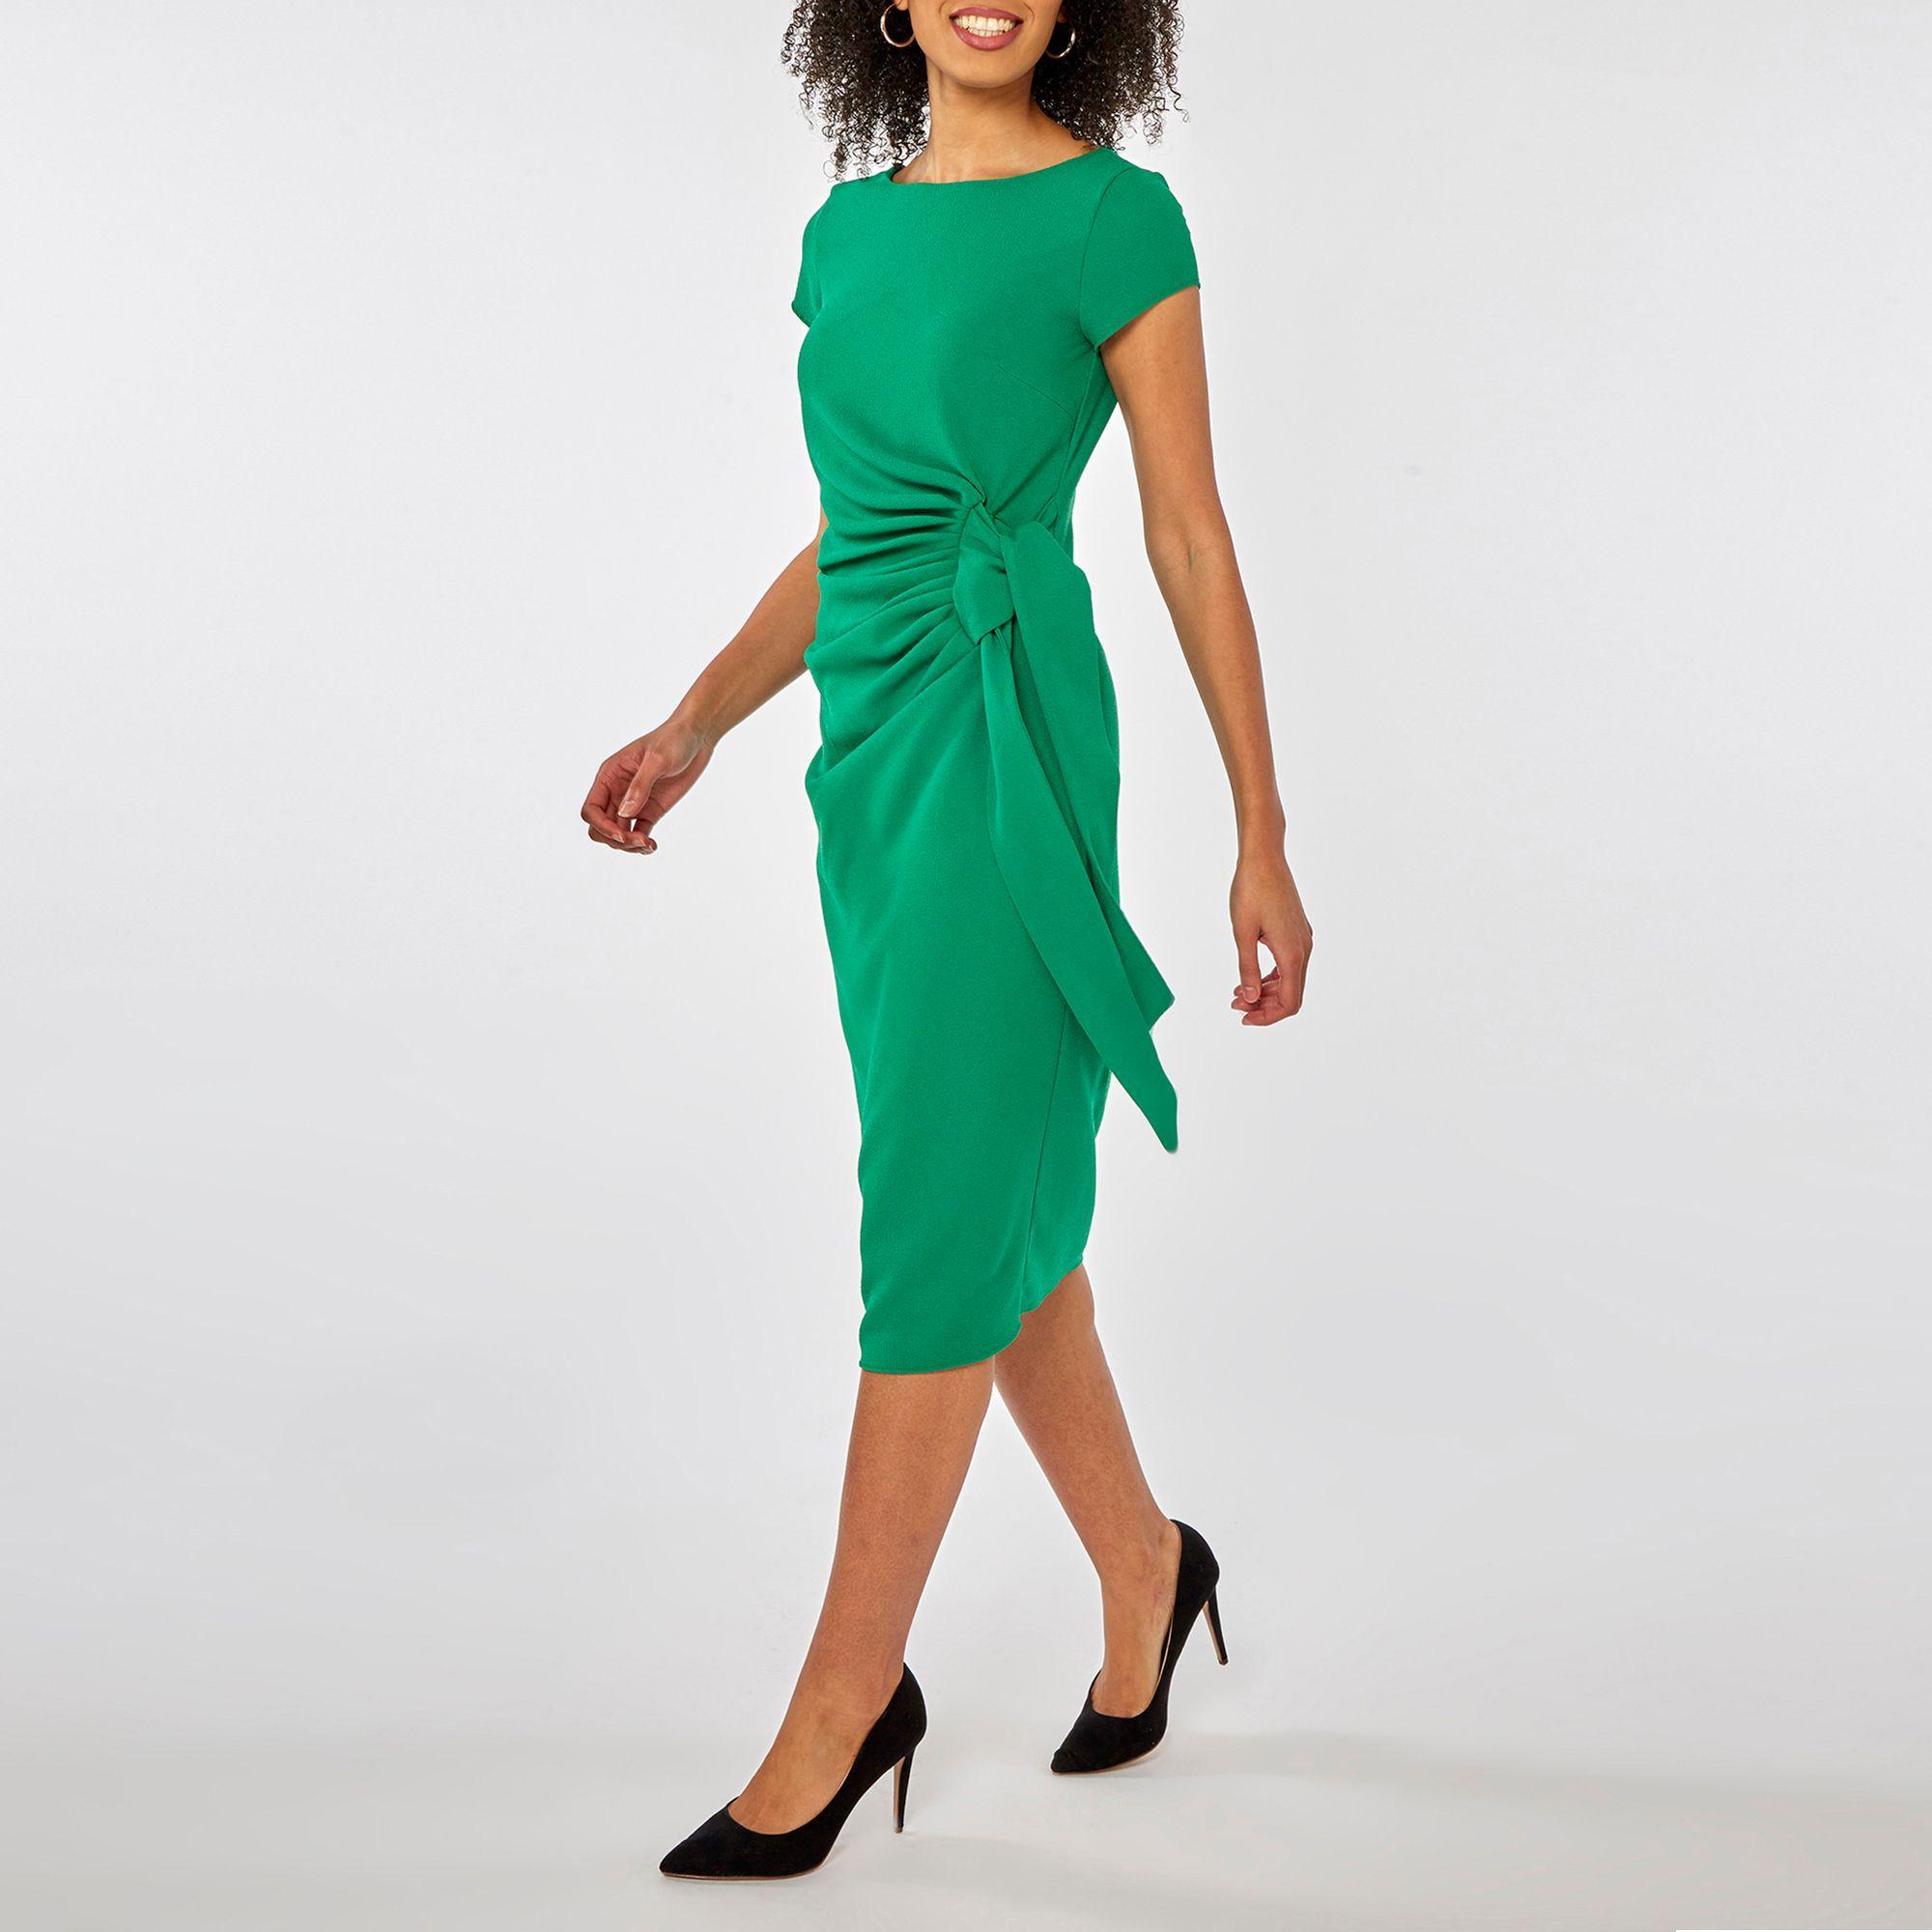 b8649f4418 Dorothy Perkins Green Shift Dress in Green - Save 24% - Lyst